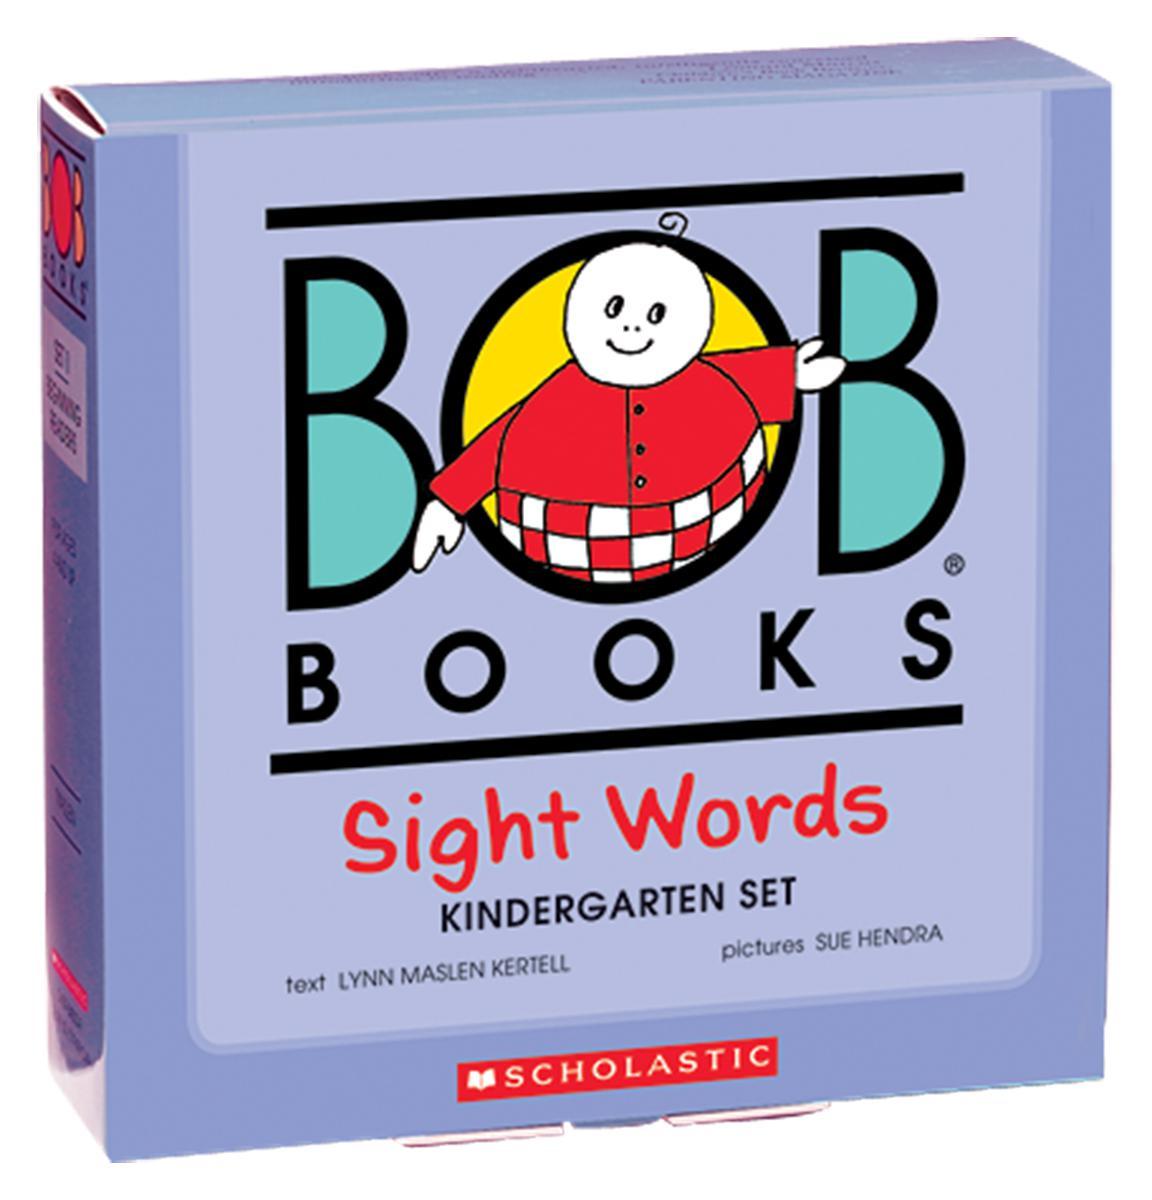 BOB Books®: Sight Words Kindergarten Box Set